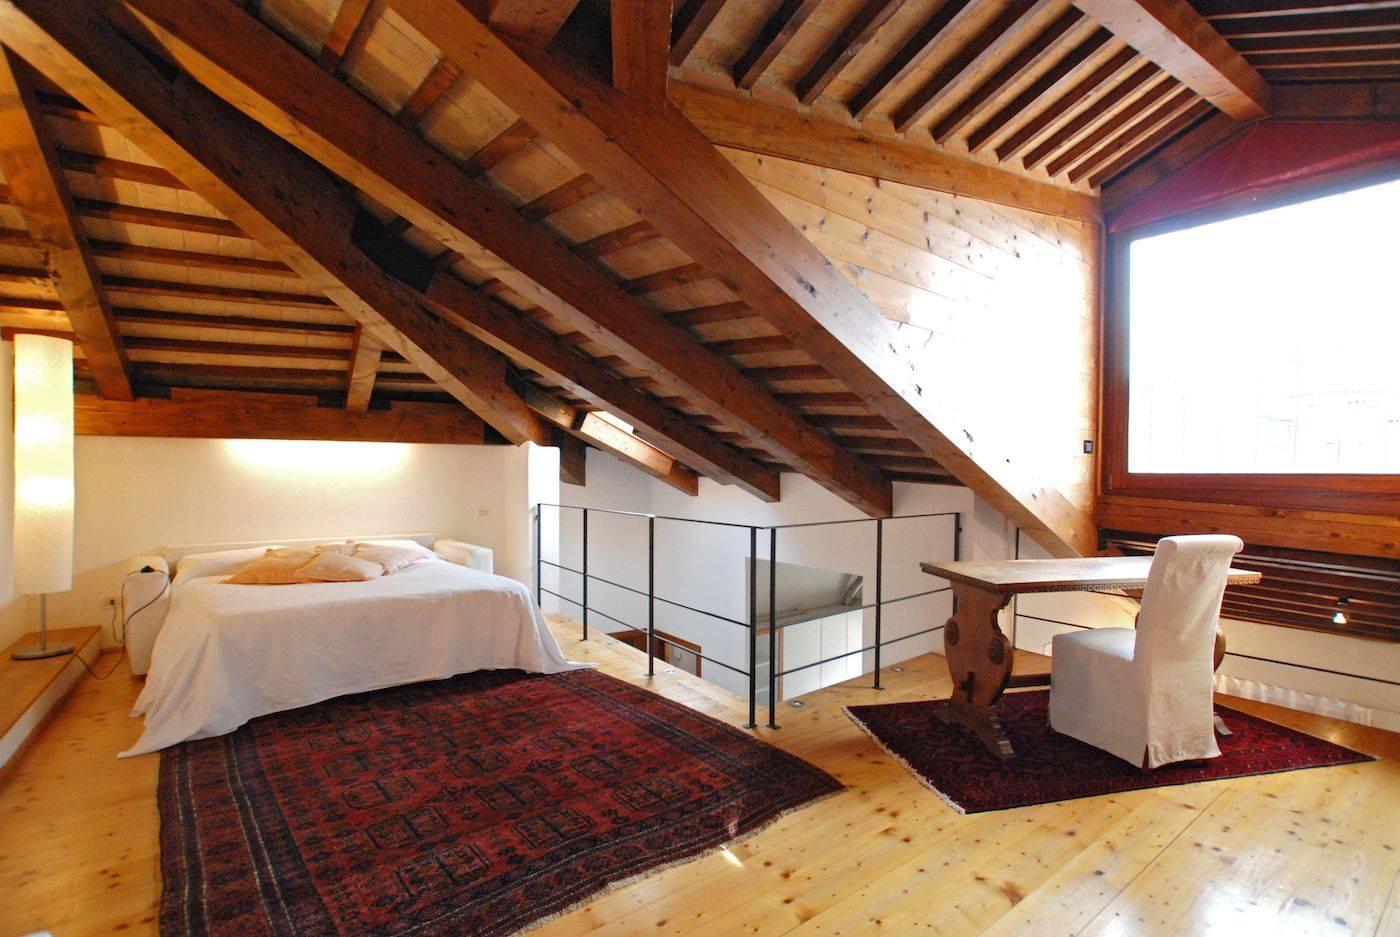 Greci Loft central, spacious and light